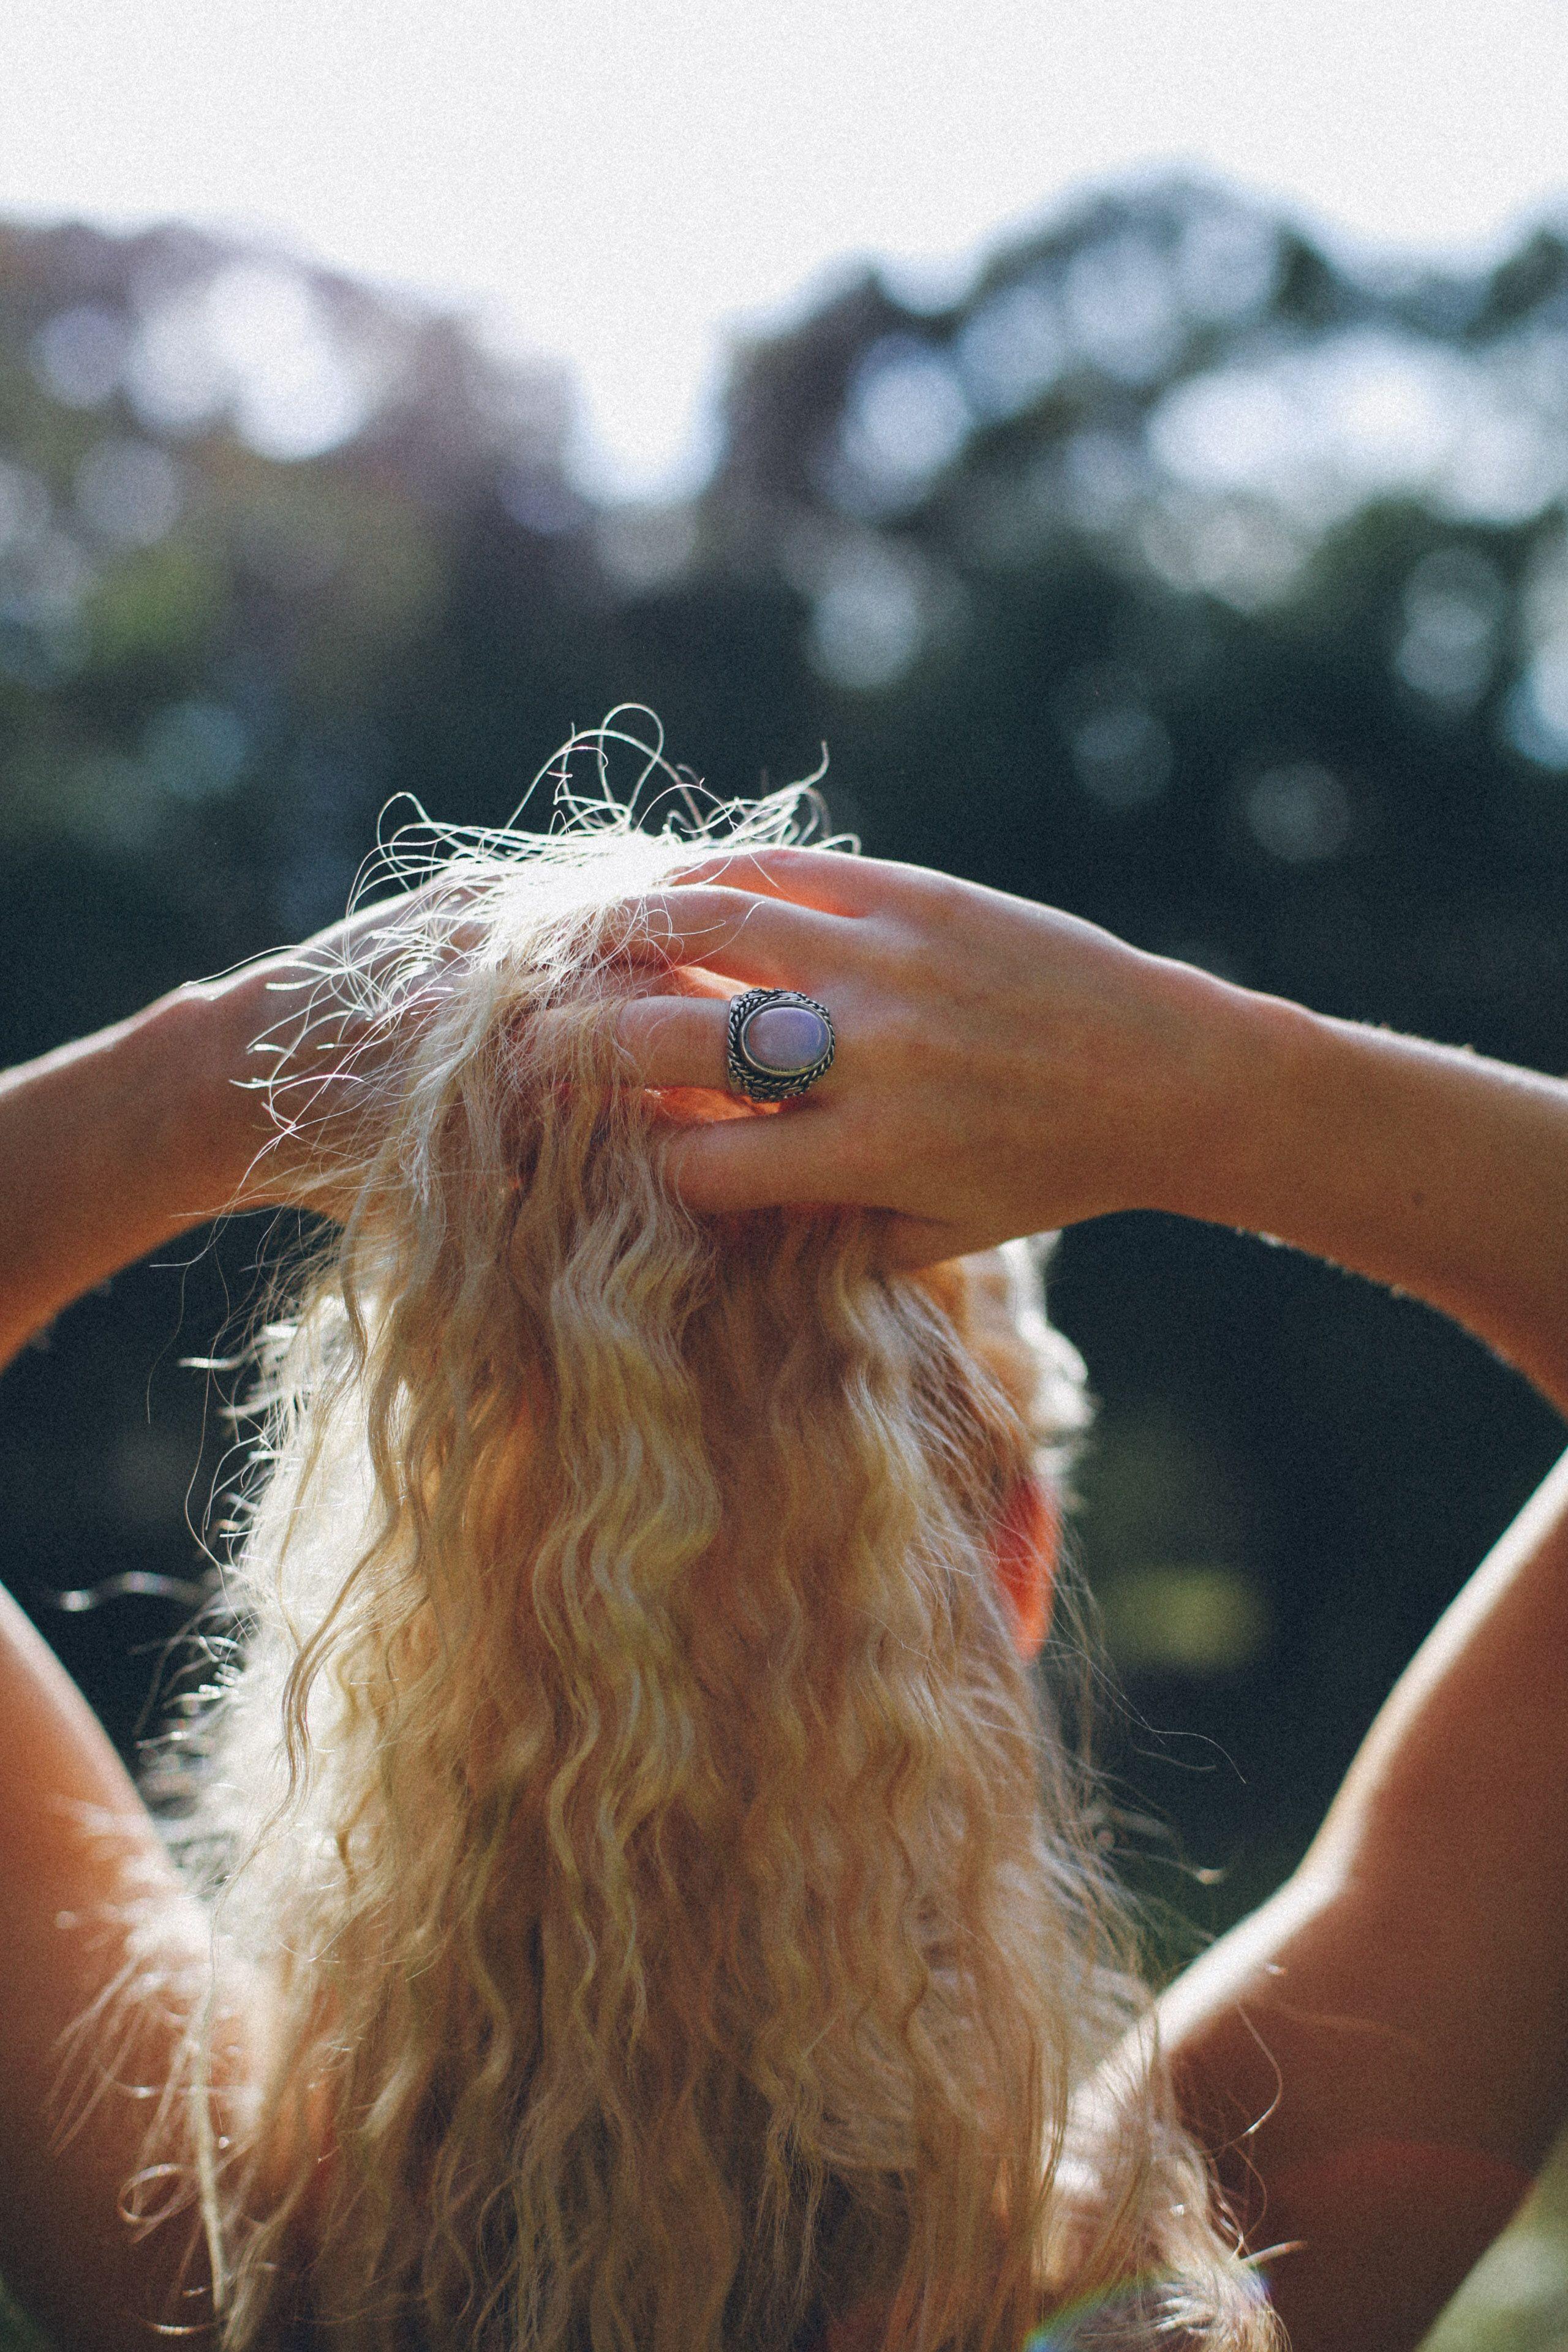 Gypsy jewels. Photographer: Celeste Larkins Photography